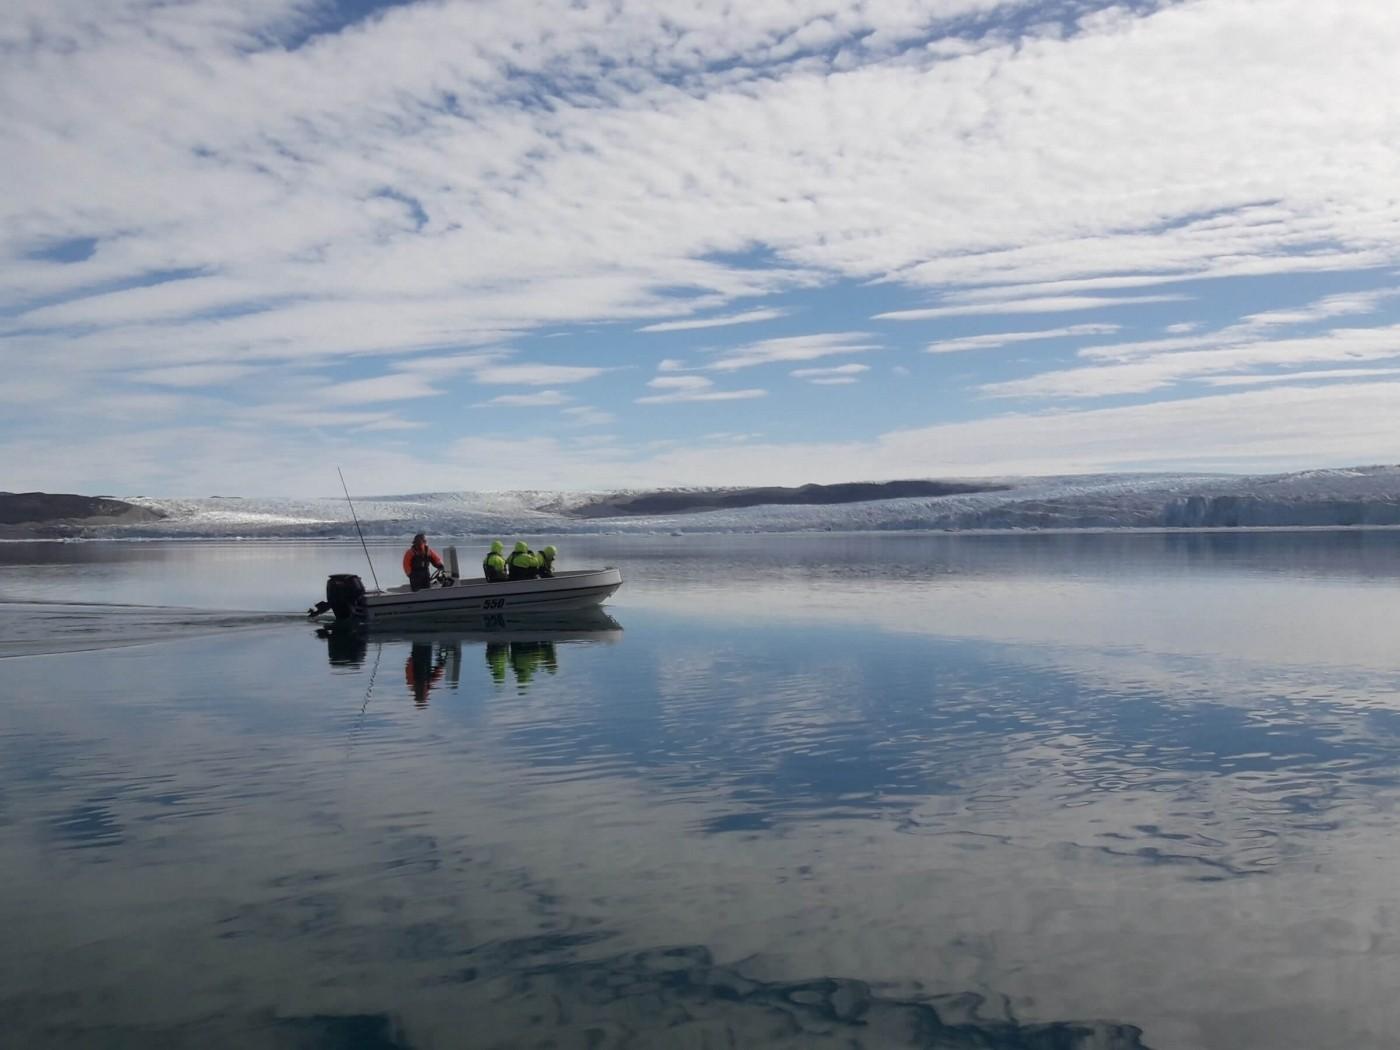 Diskobay Tours boat sailing towards glacier. Photo by Diskobay Tours